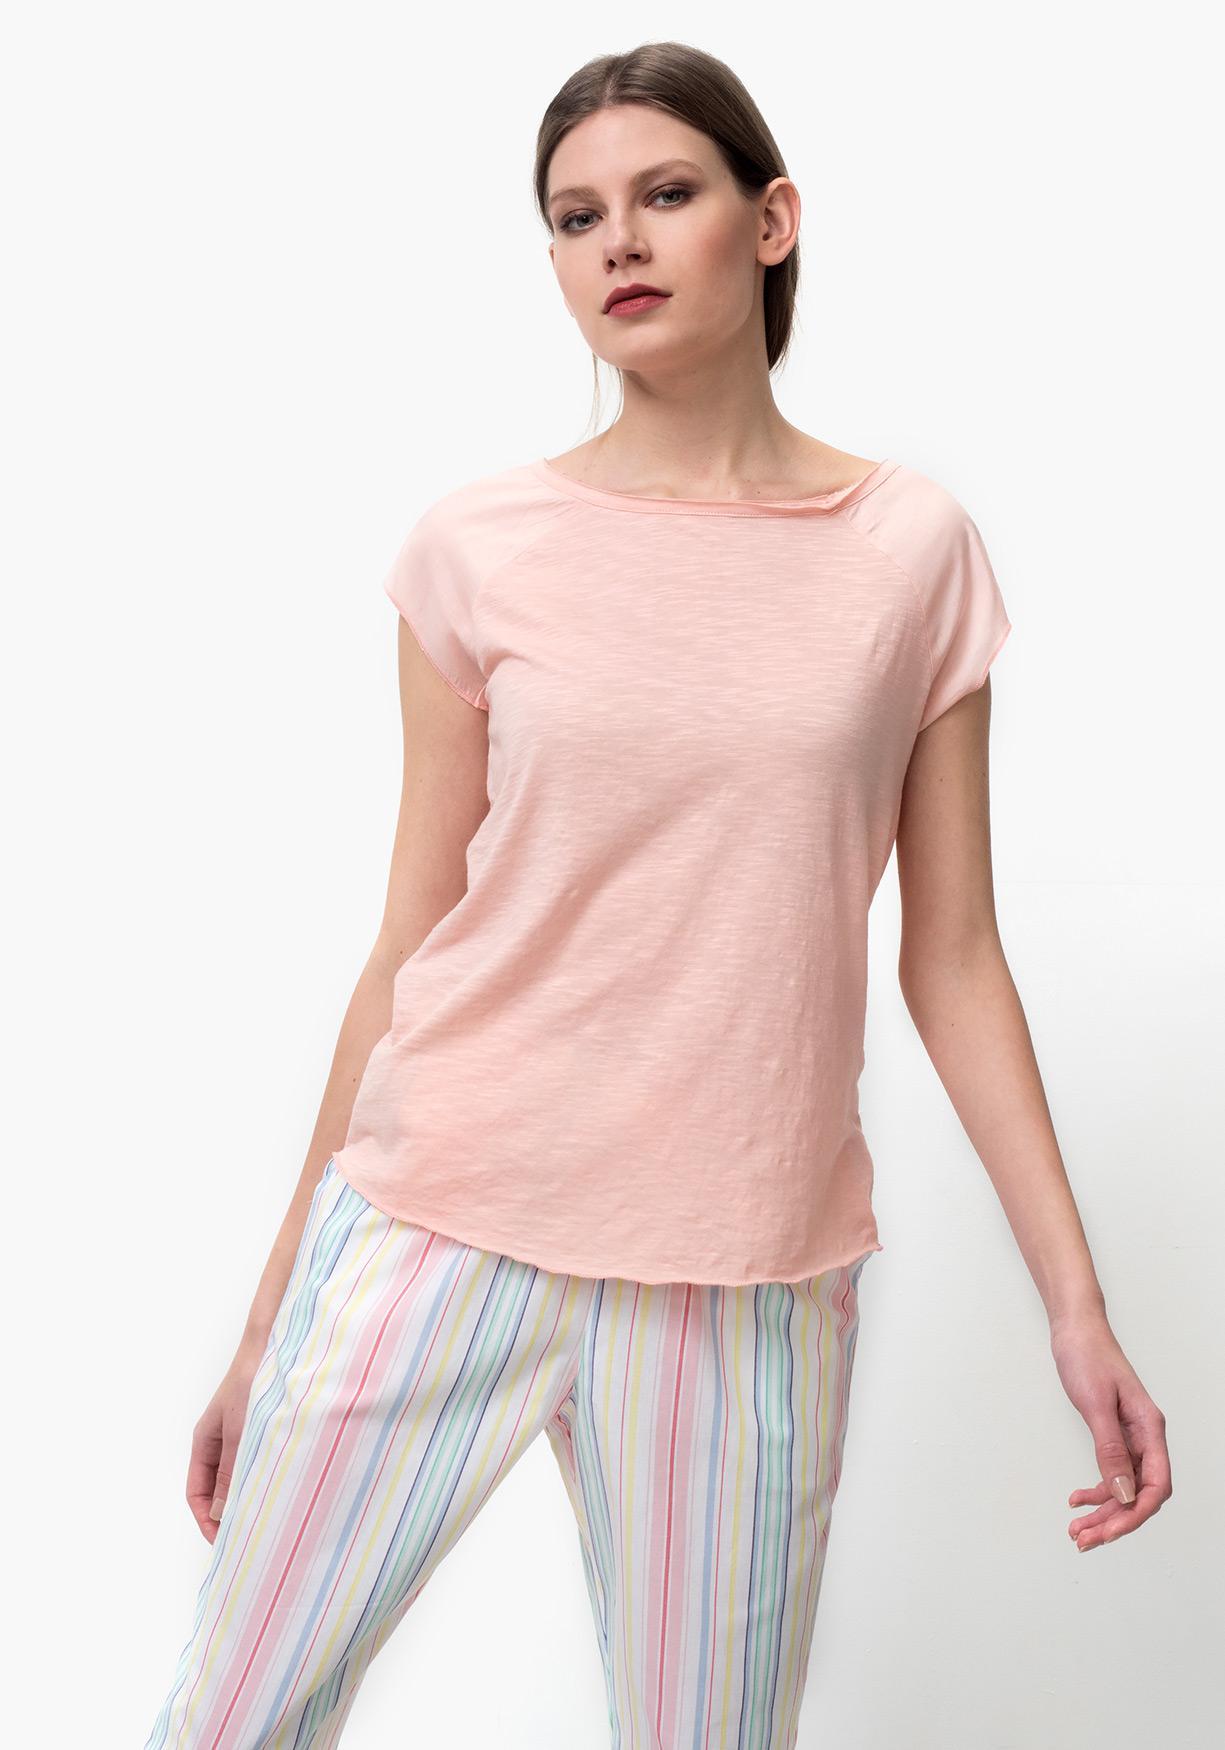 Comprar Camiseta lencería de mujer manga corta TEX. ¡Aprovéchate de ... 6166a0a1312c